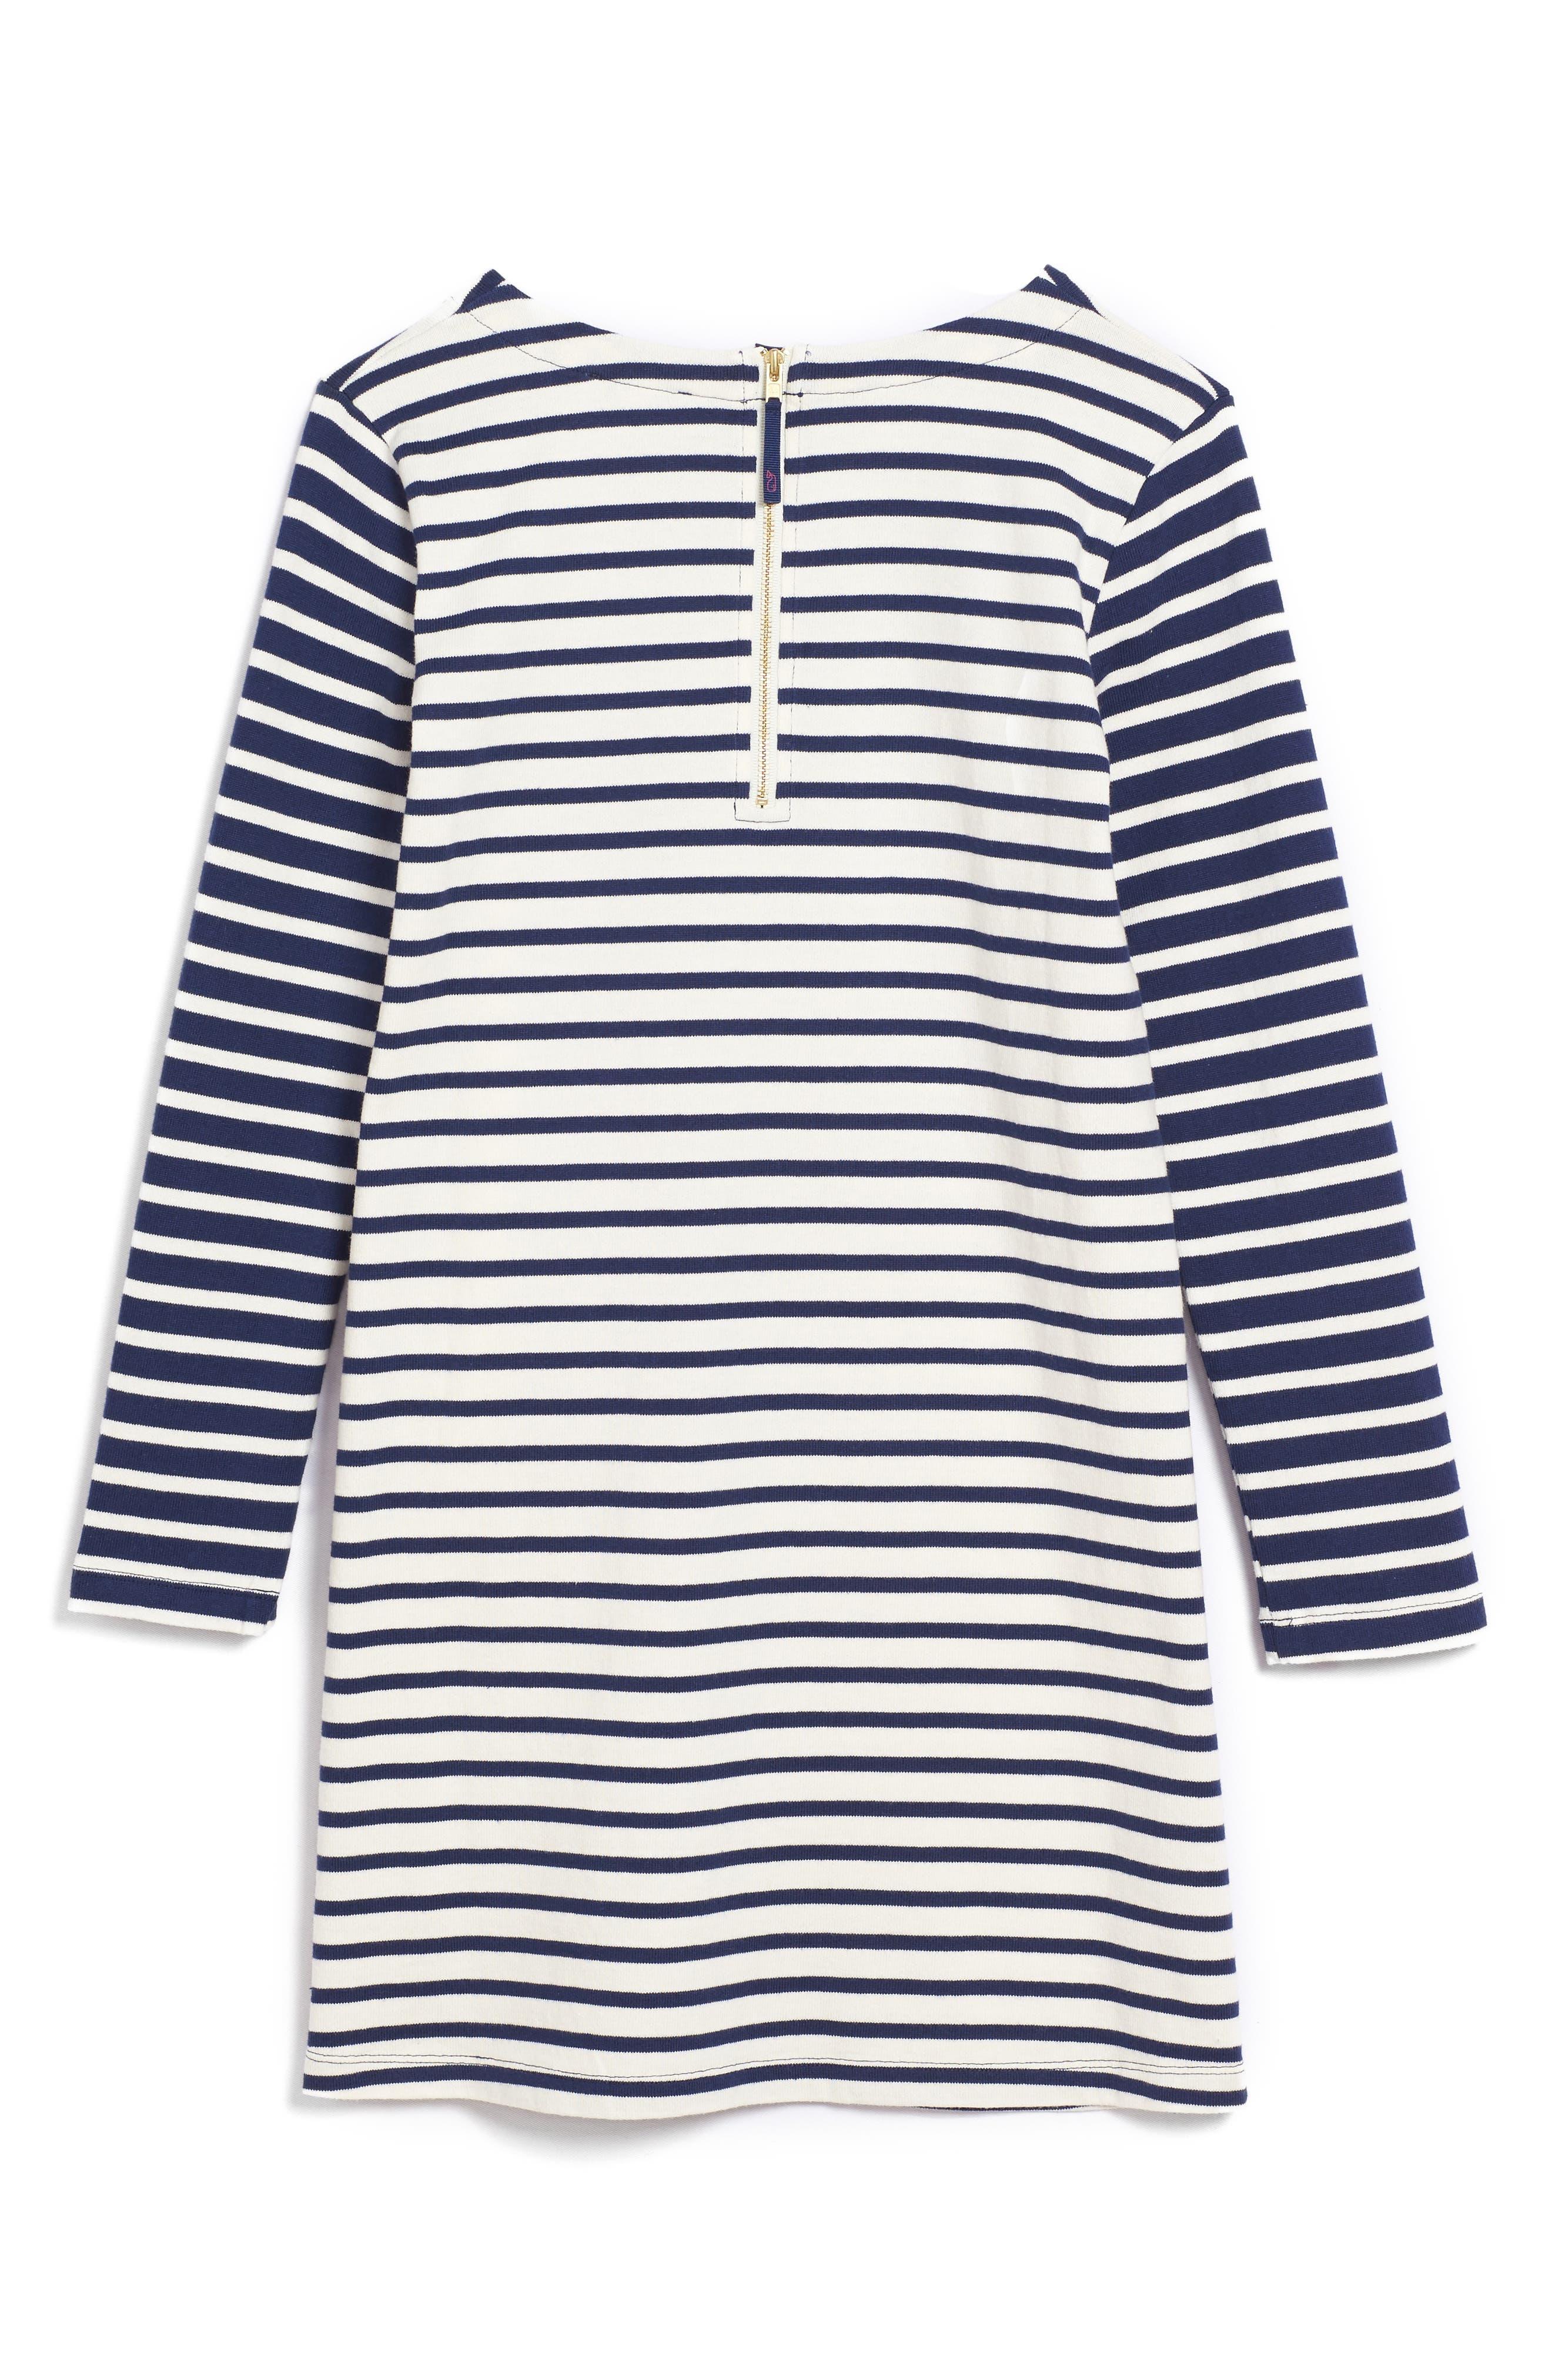 Stripe Knit Dress,                             Alternate thumbnail 2, color,                             106